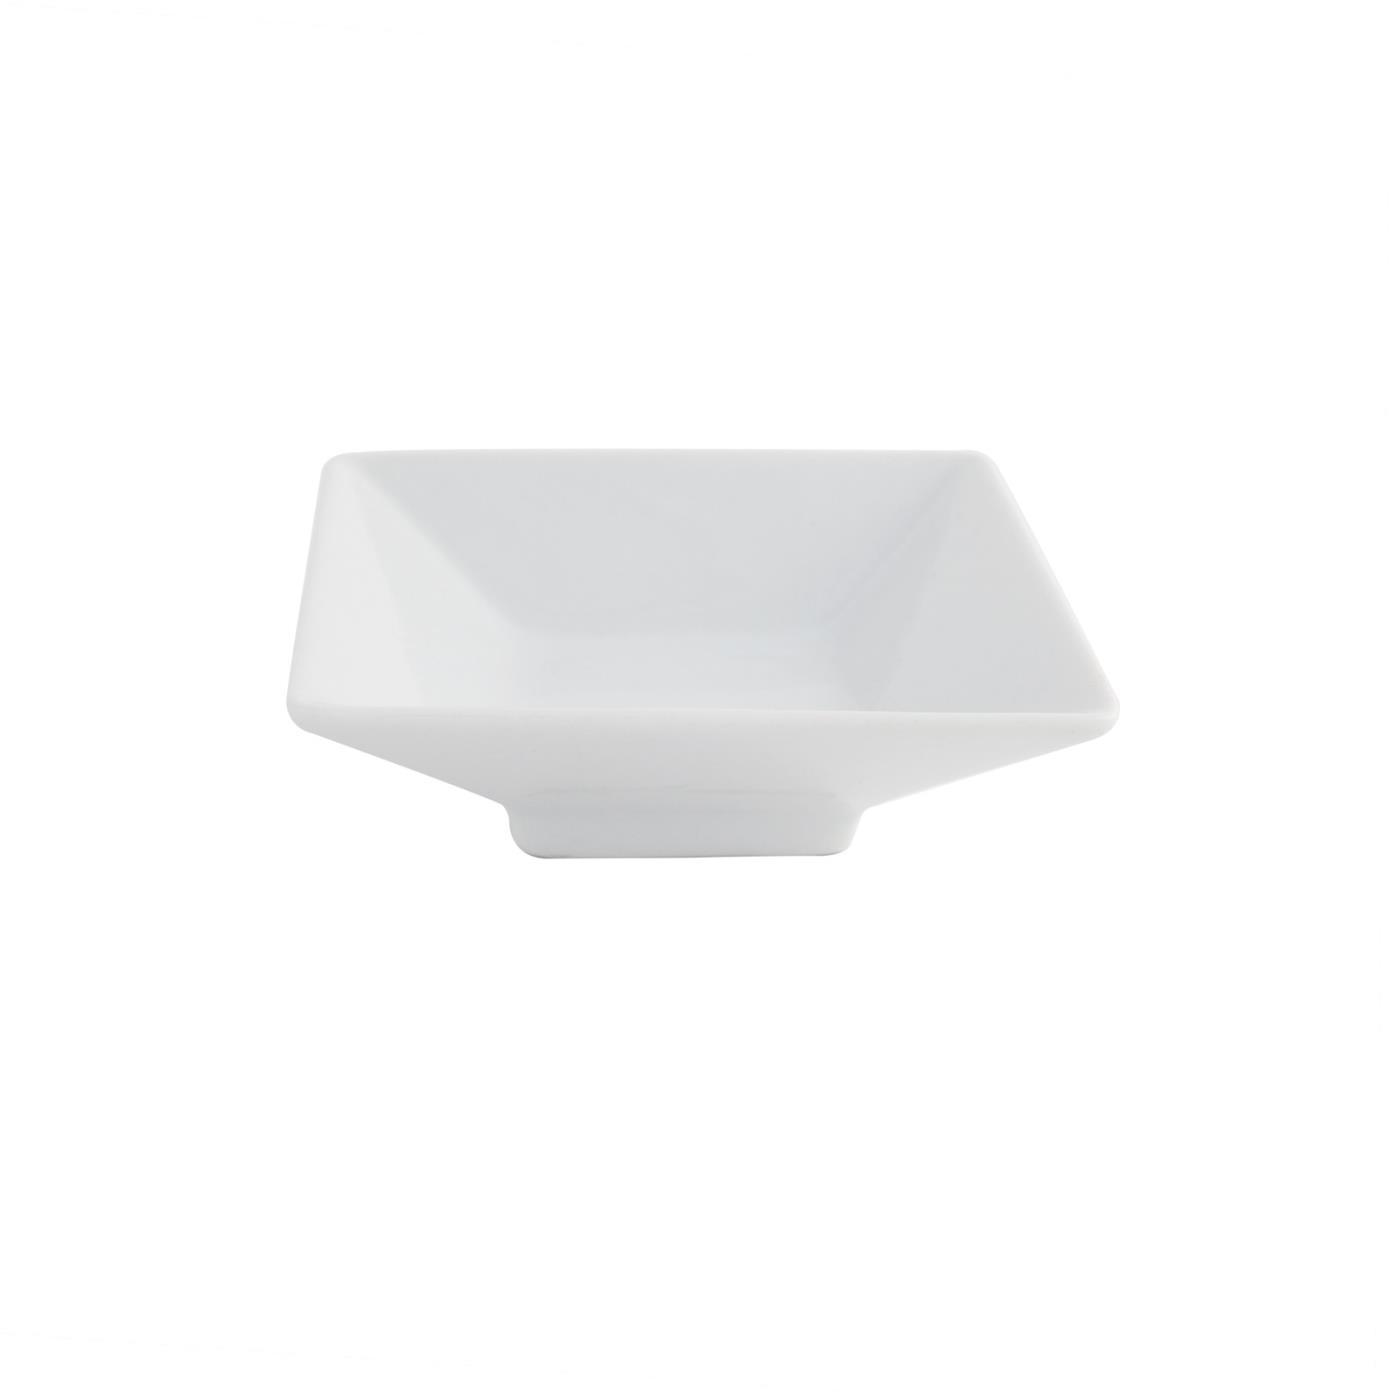 "White Square Pedestal Dish - 4"""